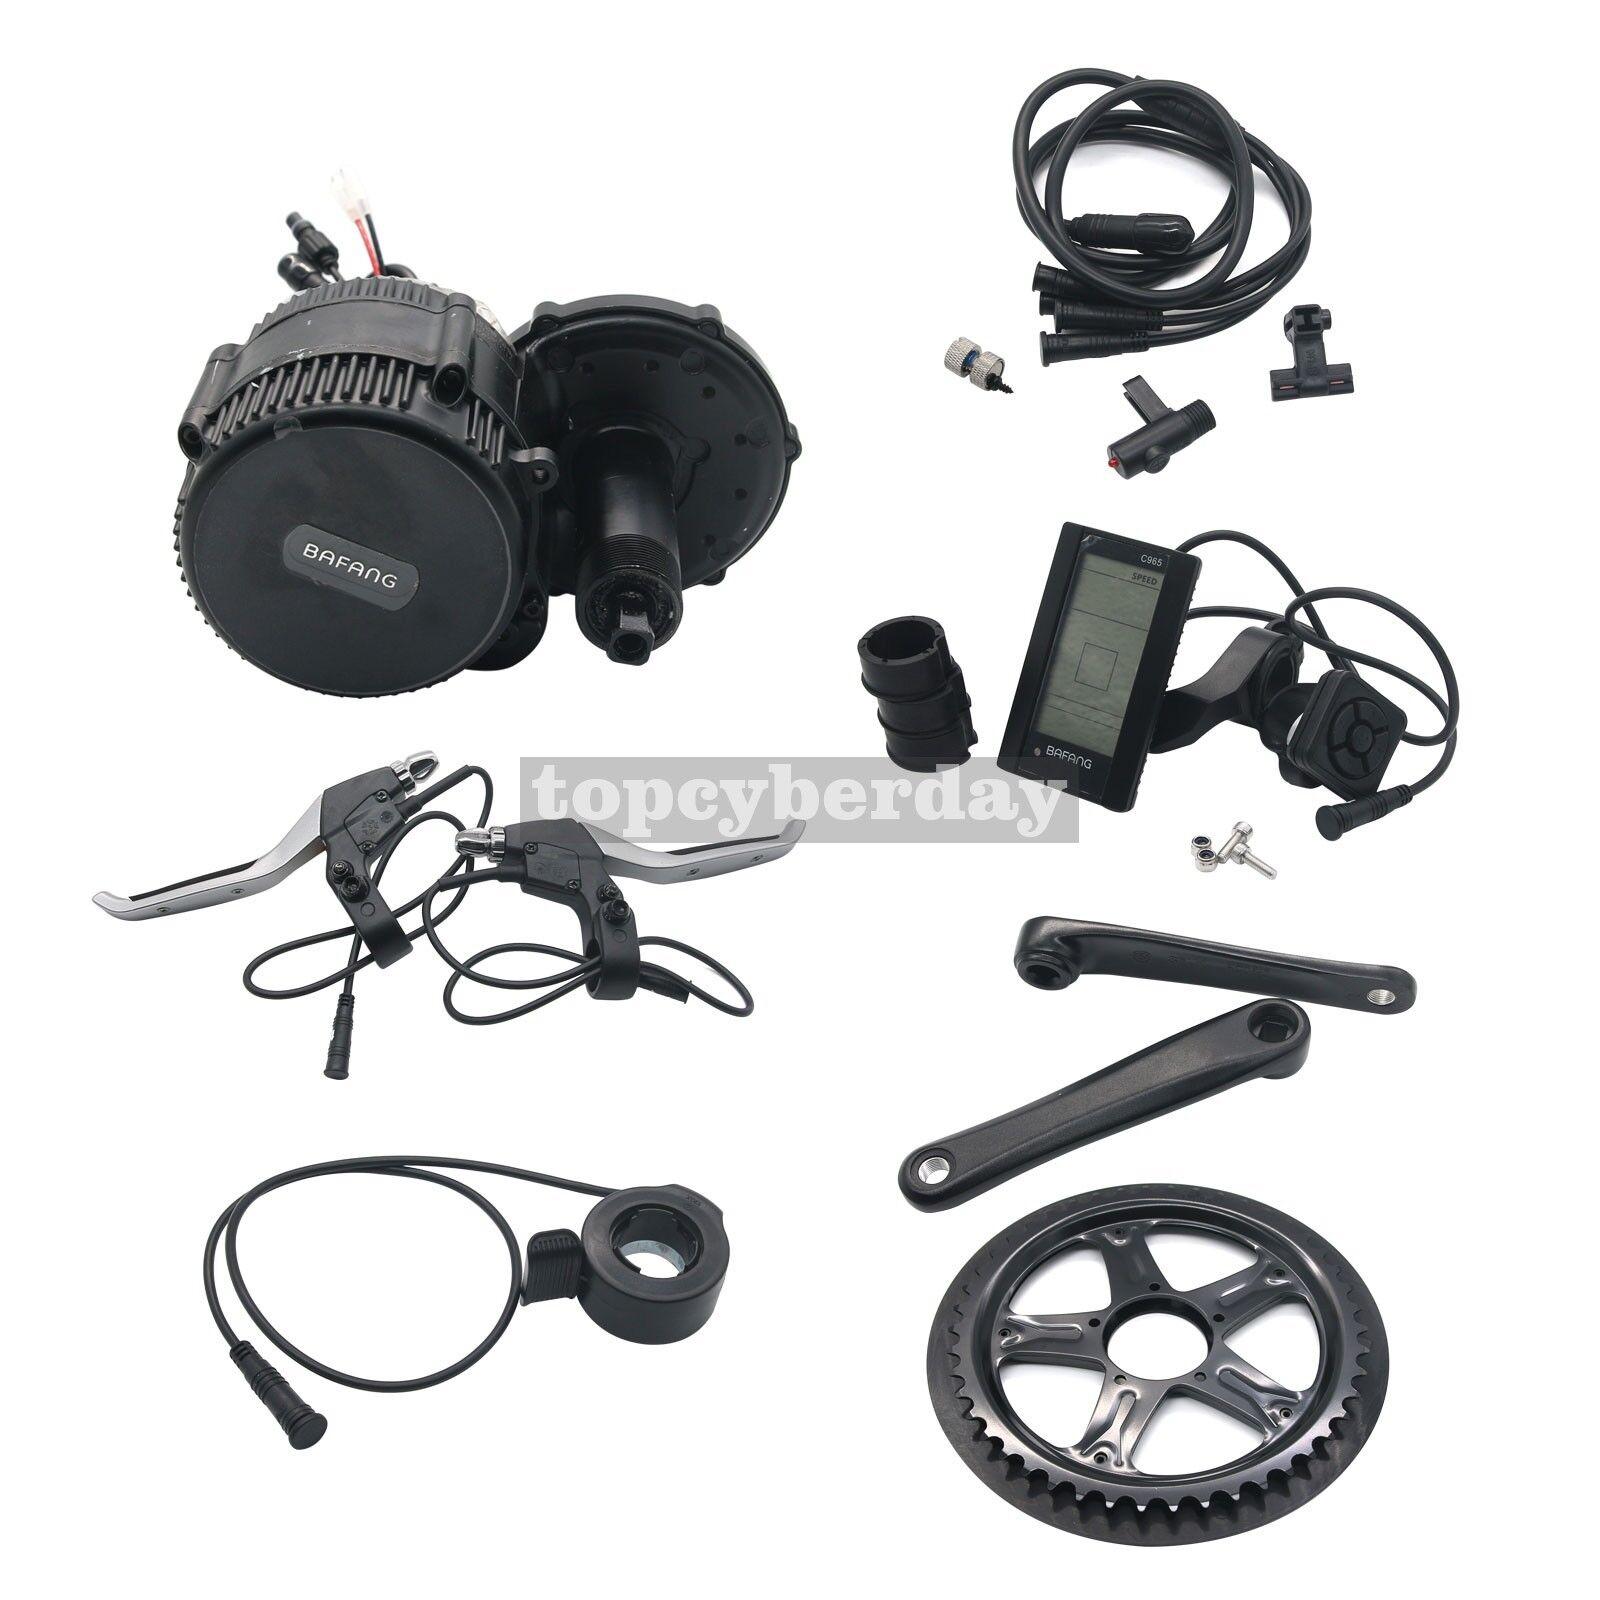 0bbs22 48v   750w 8fun - 8 - motor ciclomotor Transform Kit BB  68 mm